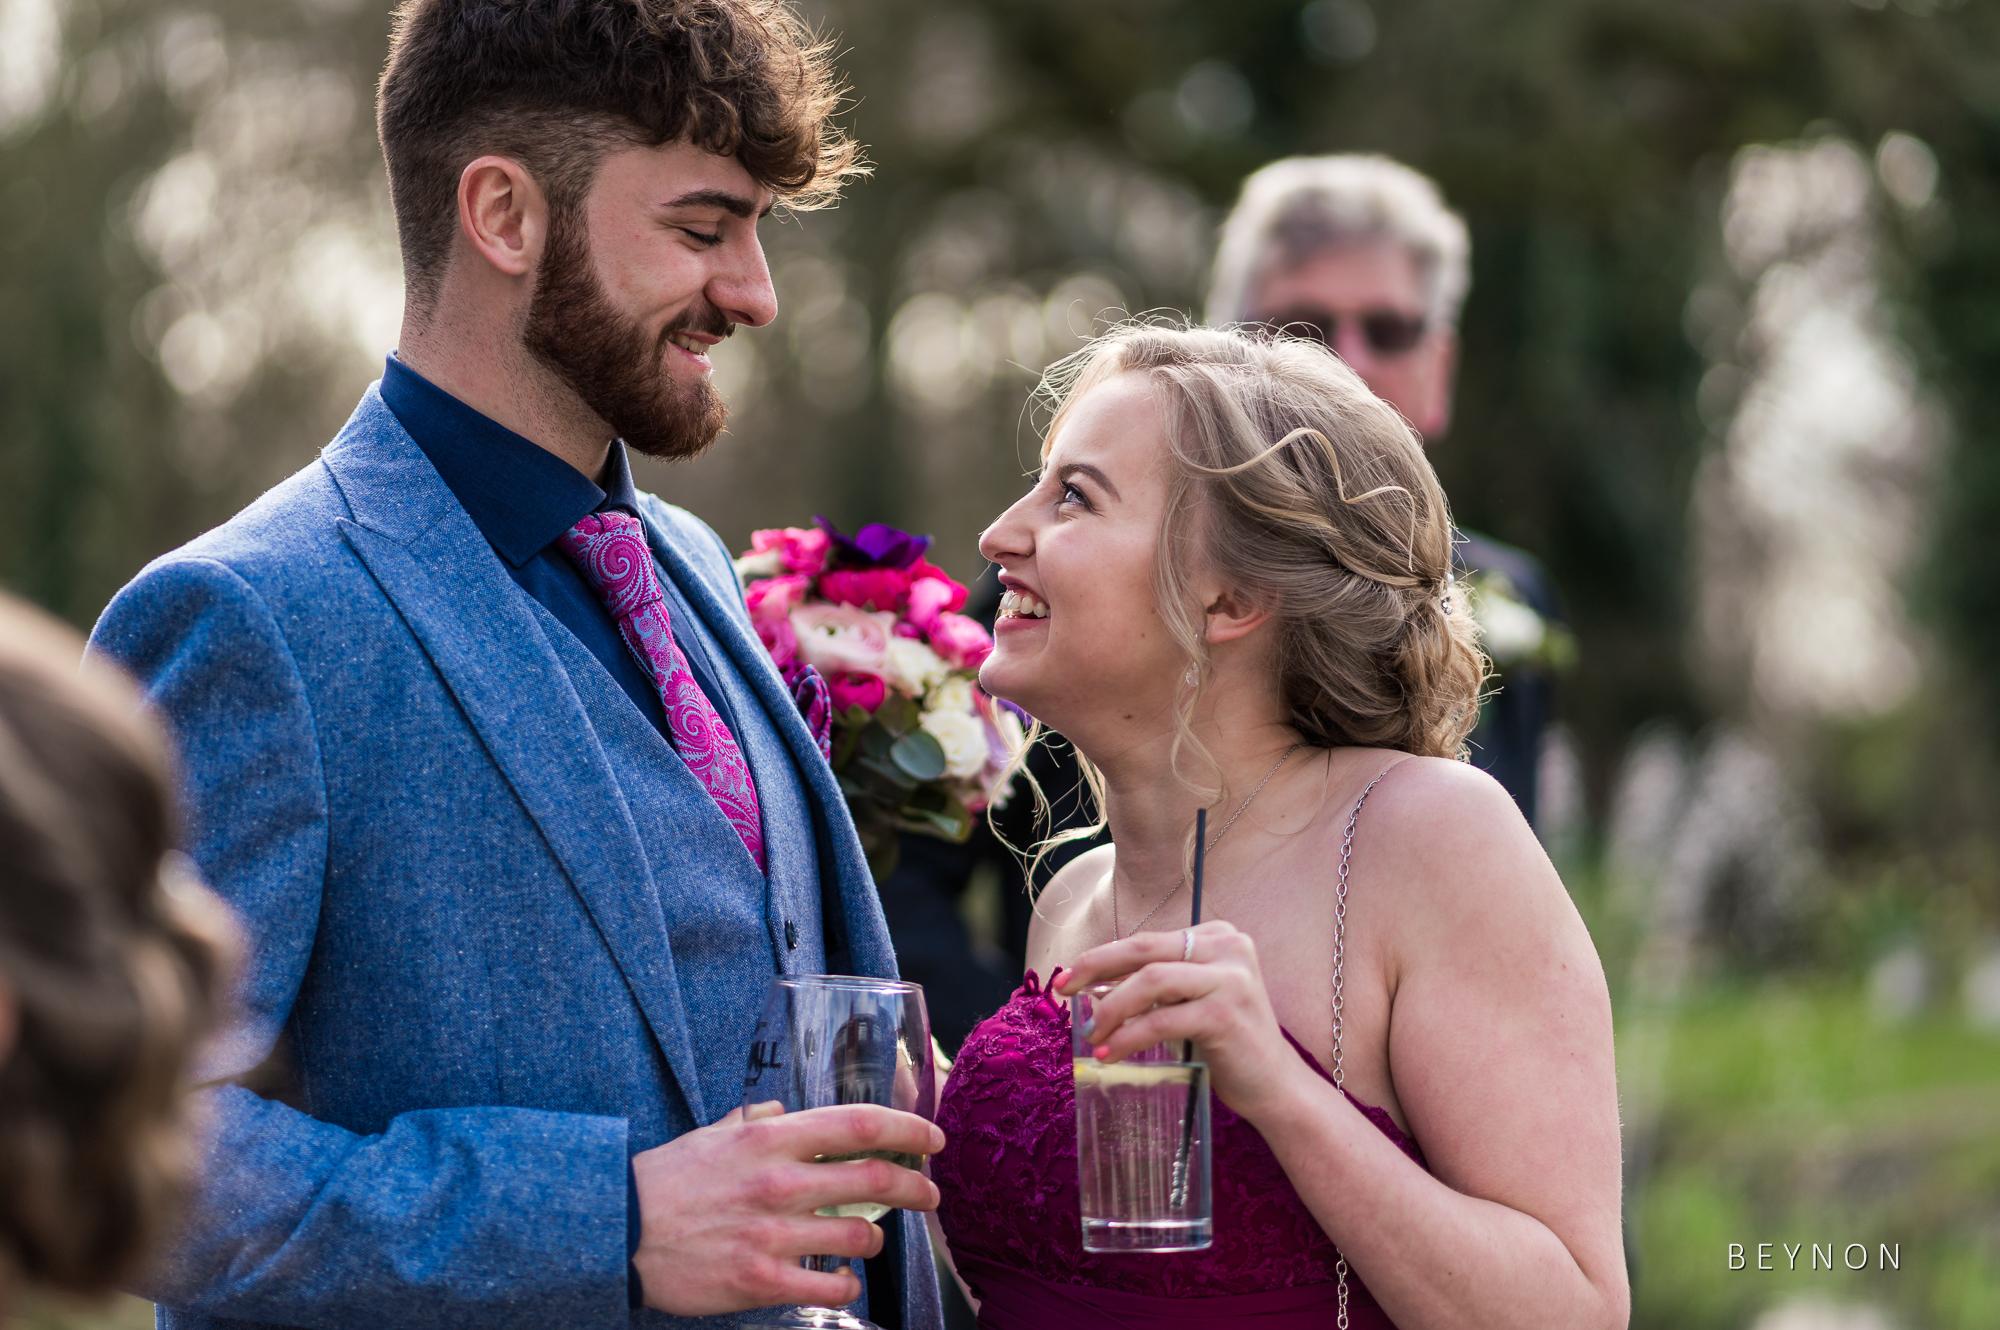 Wedding guests enjoy the spring sunshine